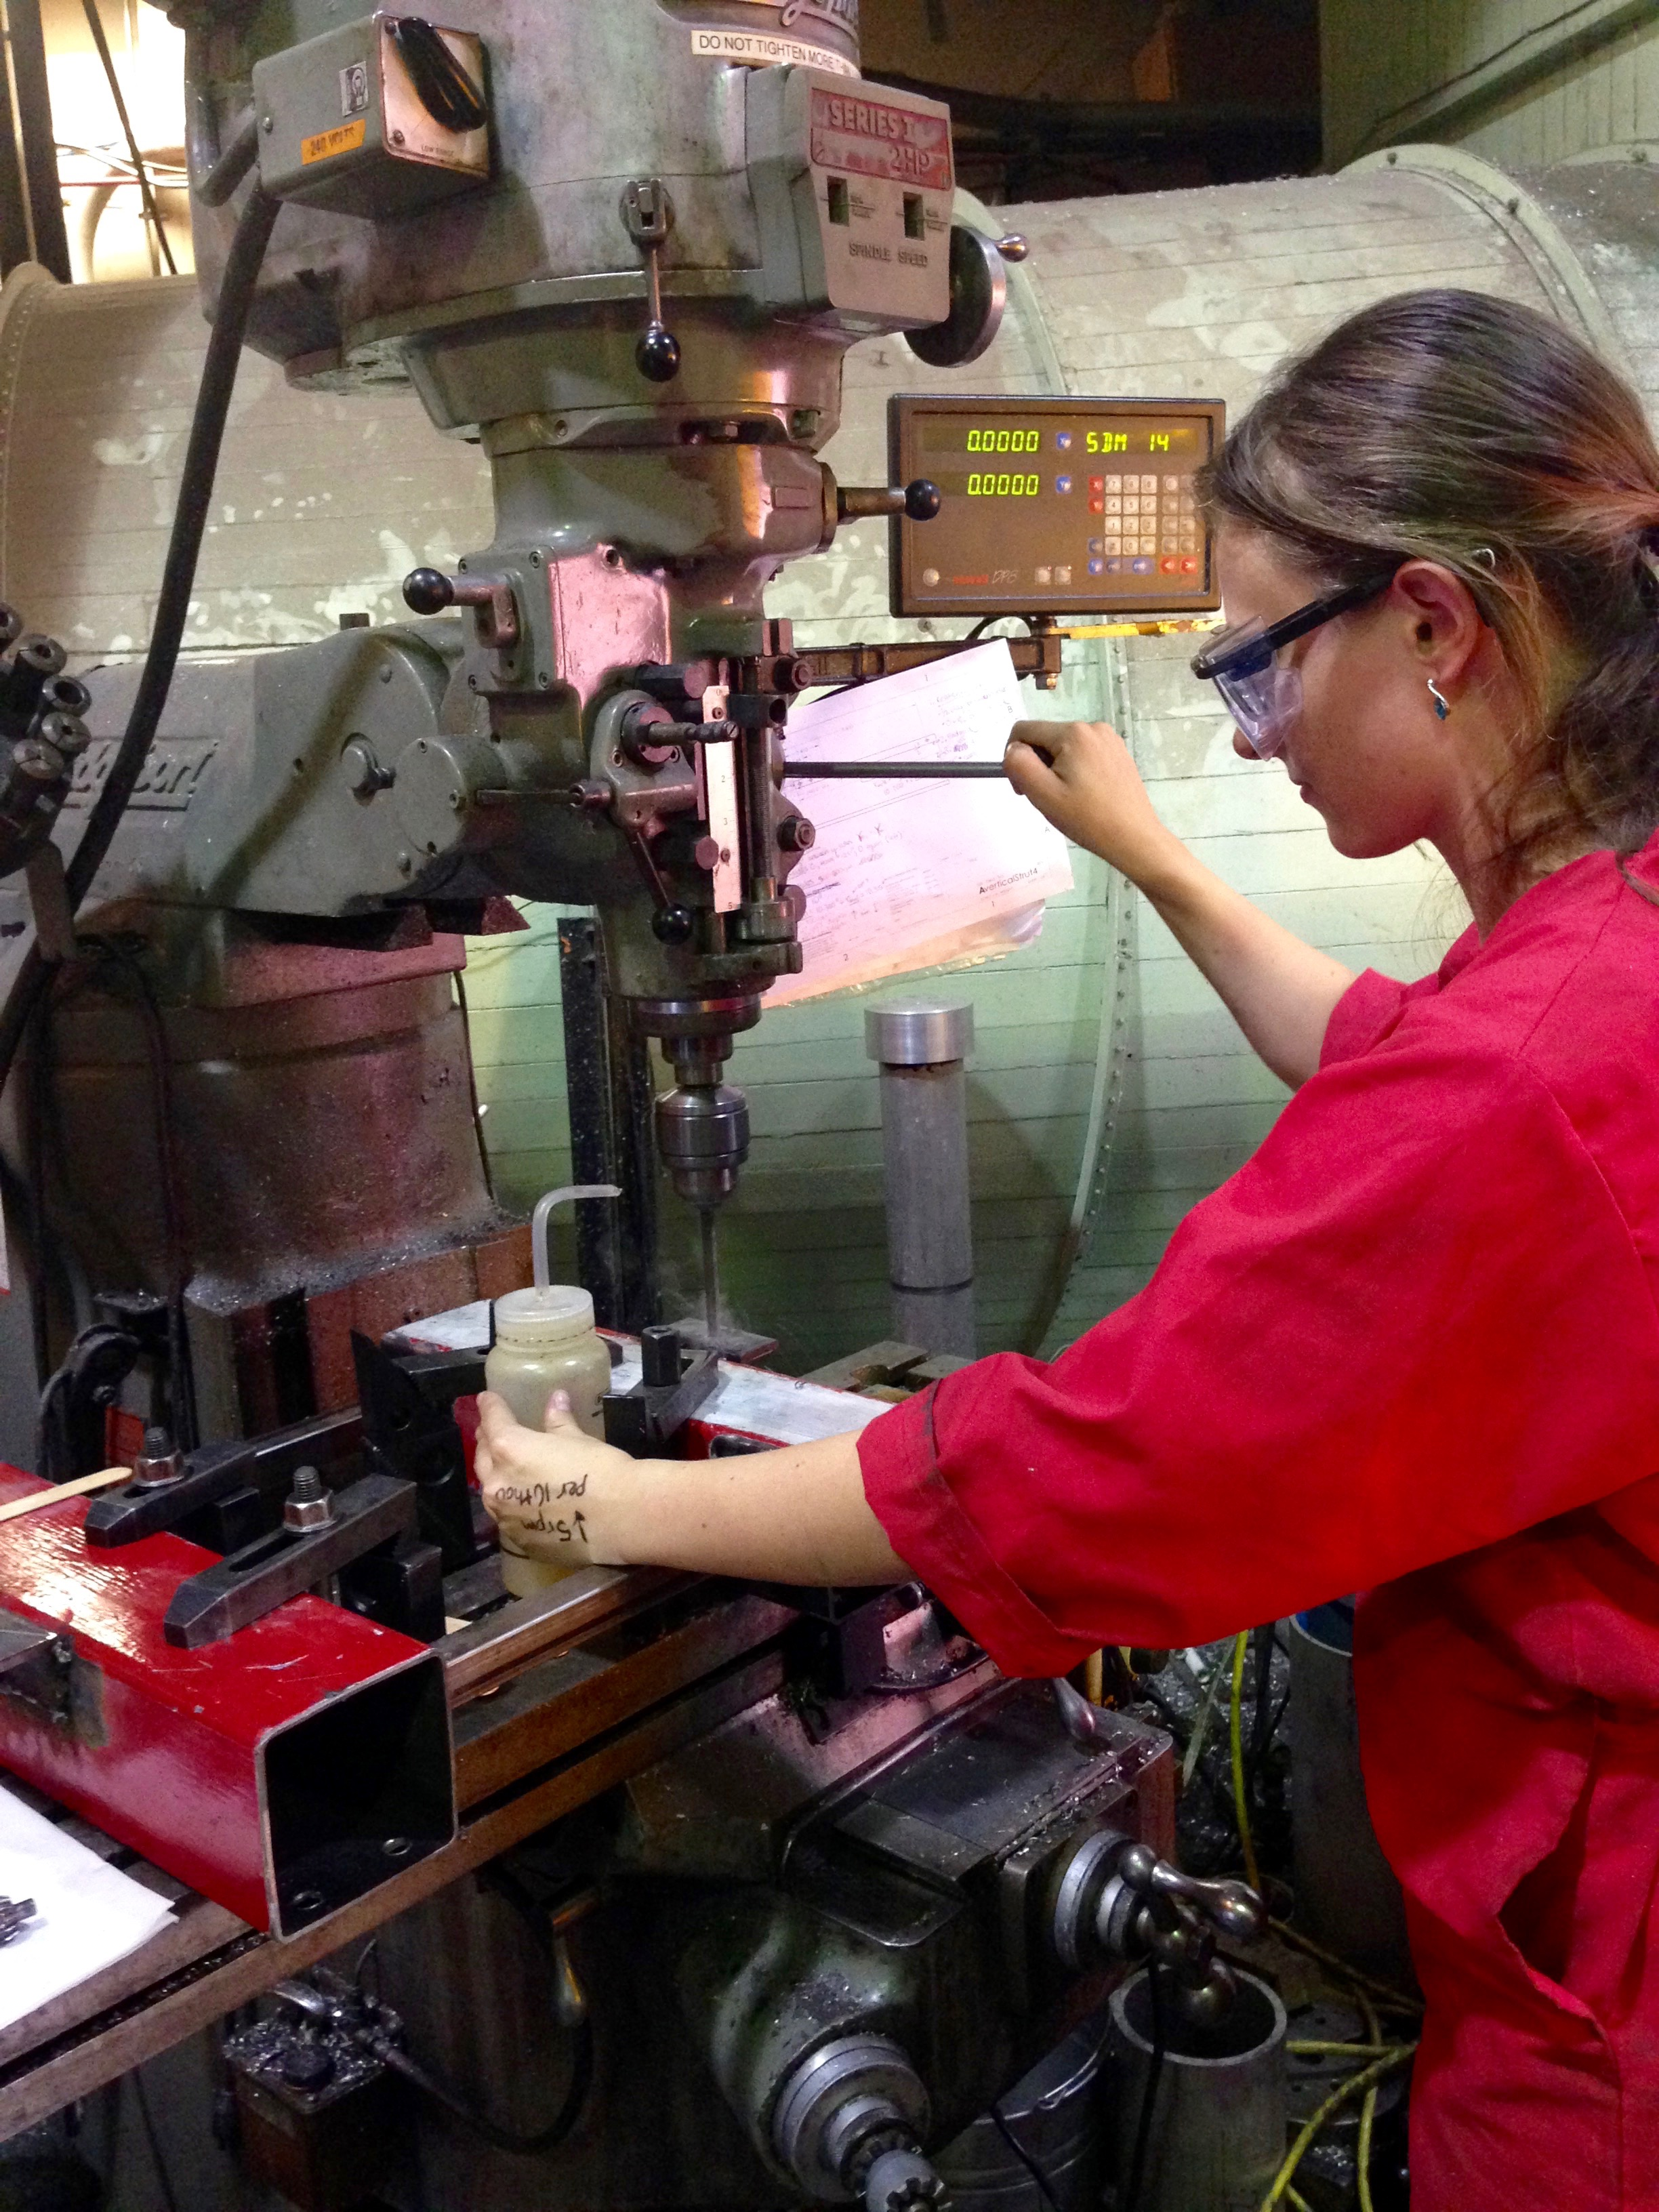 Skye Mceowen machining the avionics unit structure on the mill